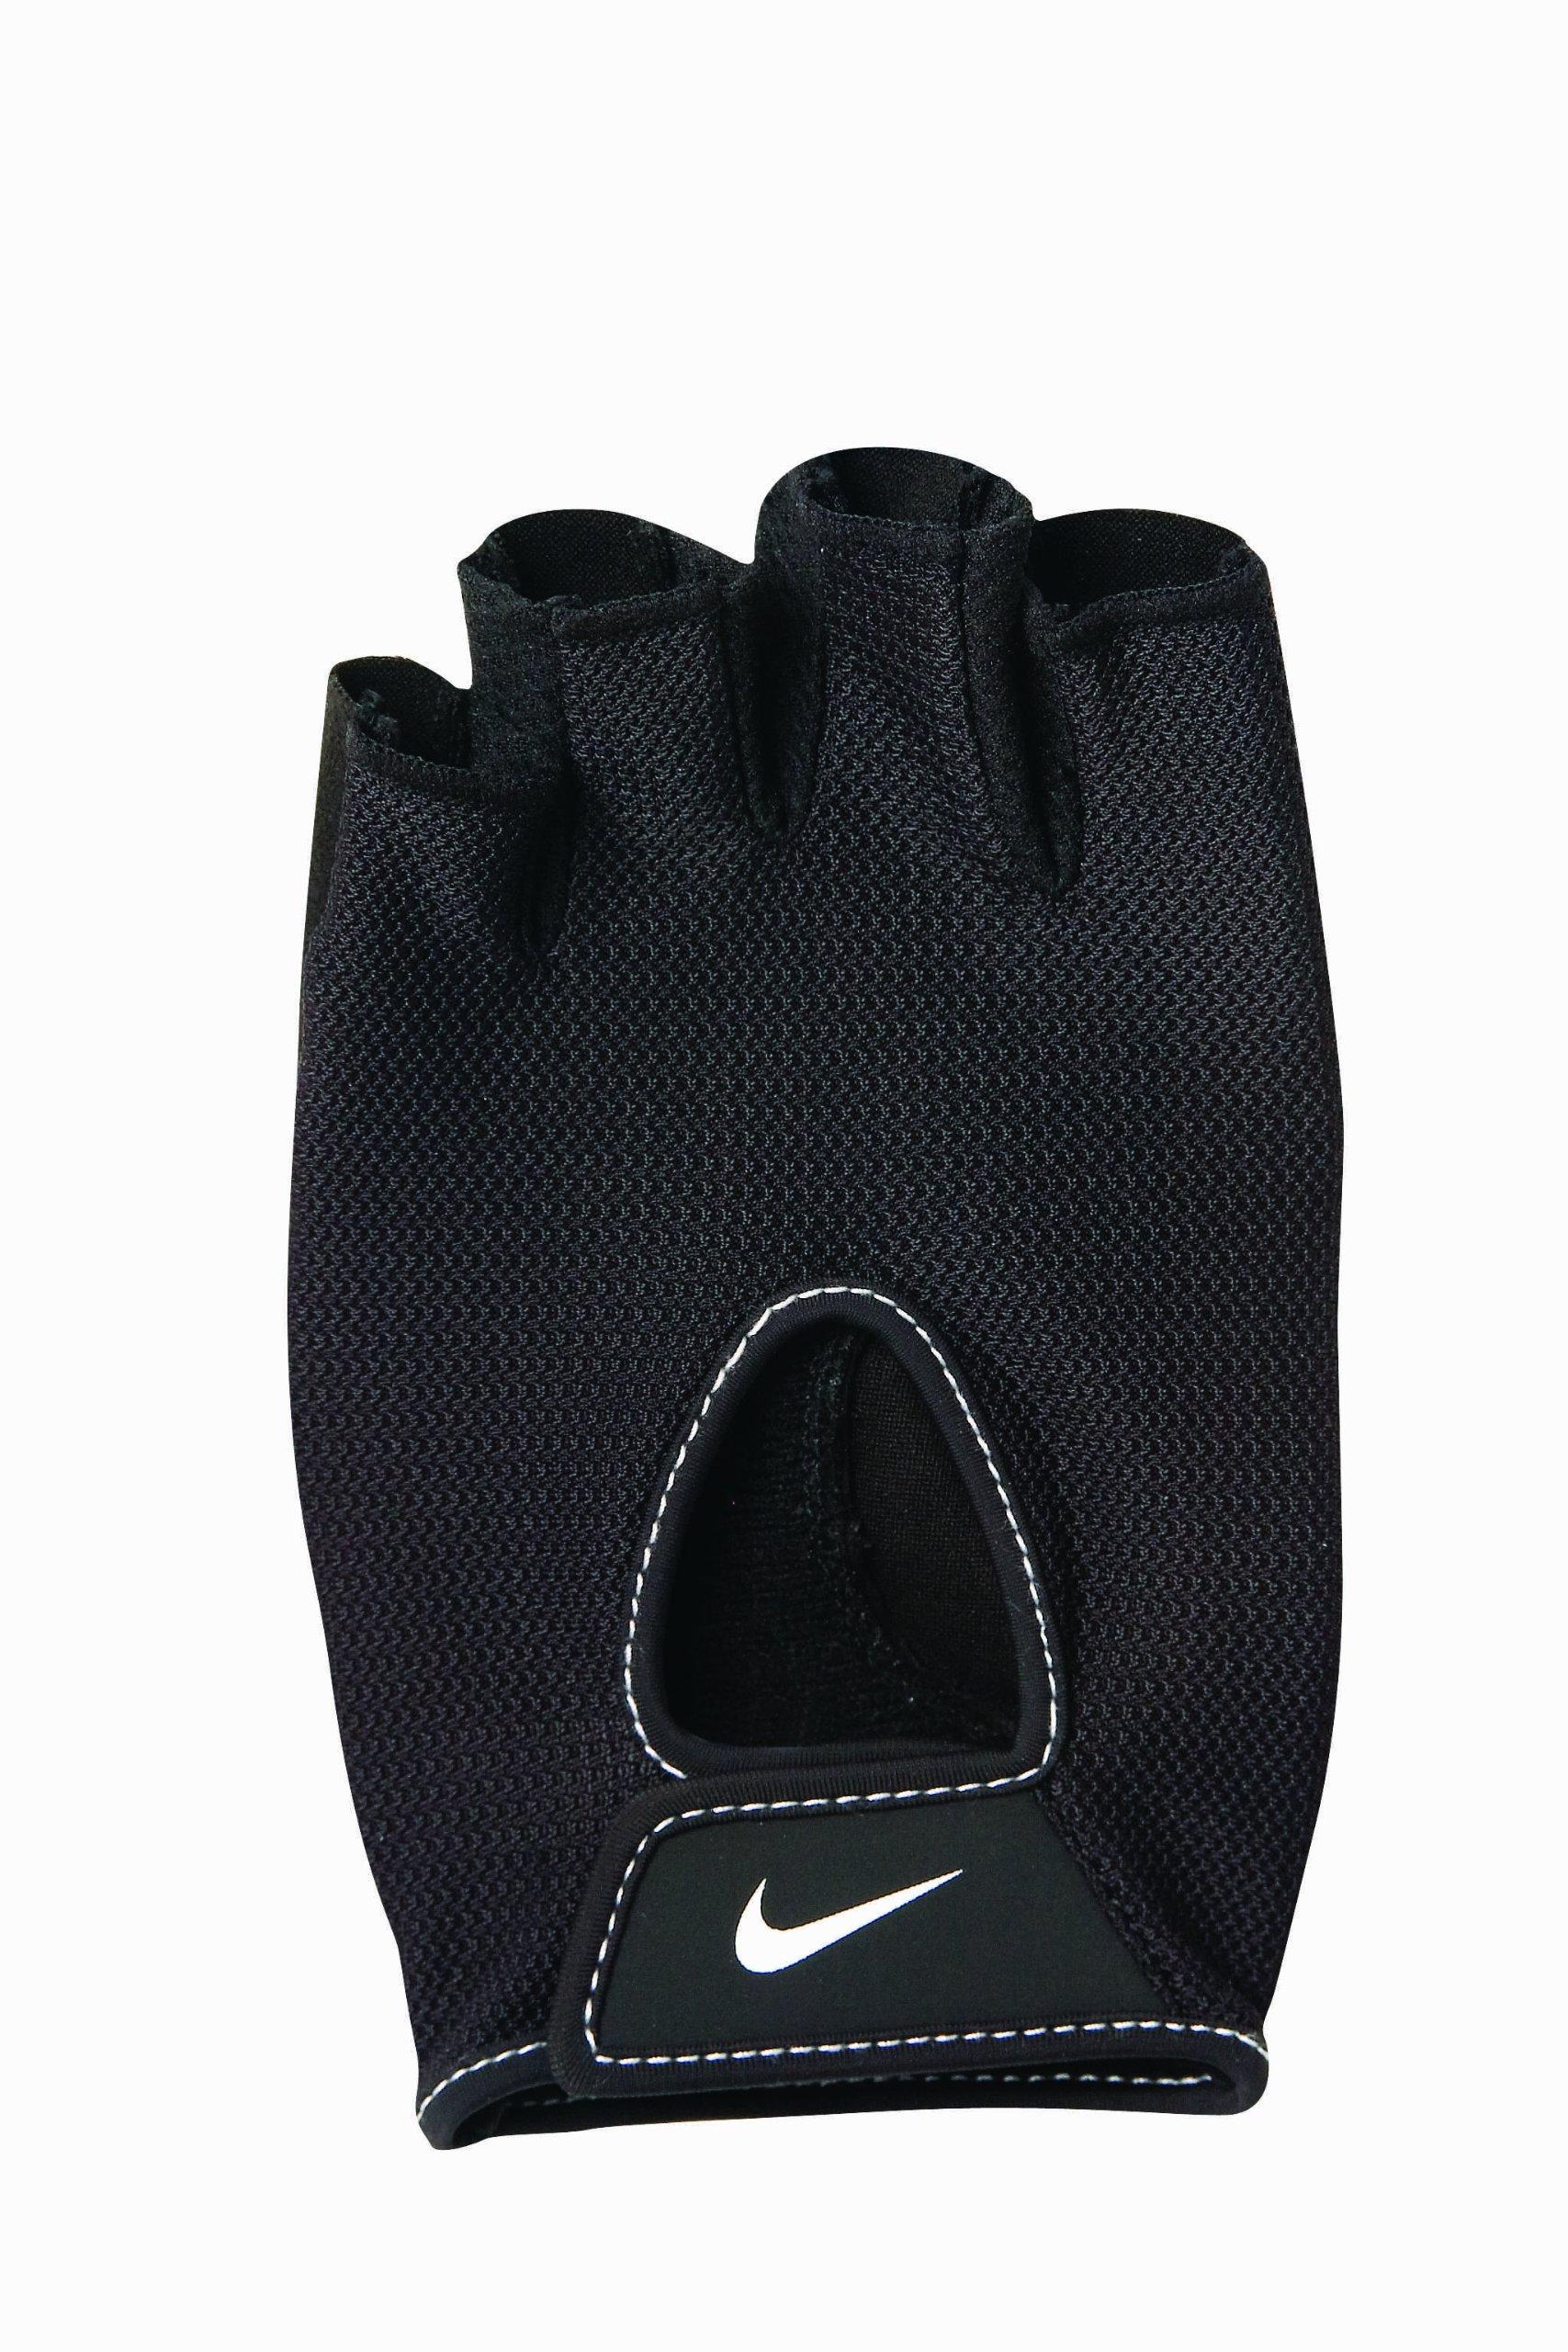 Nike Women's Fundamental Training Gloves II (Black/White, Medium) by Nike